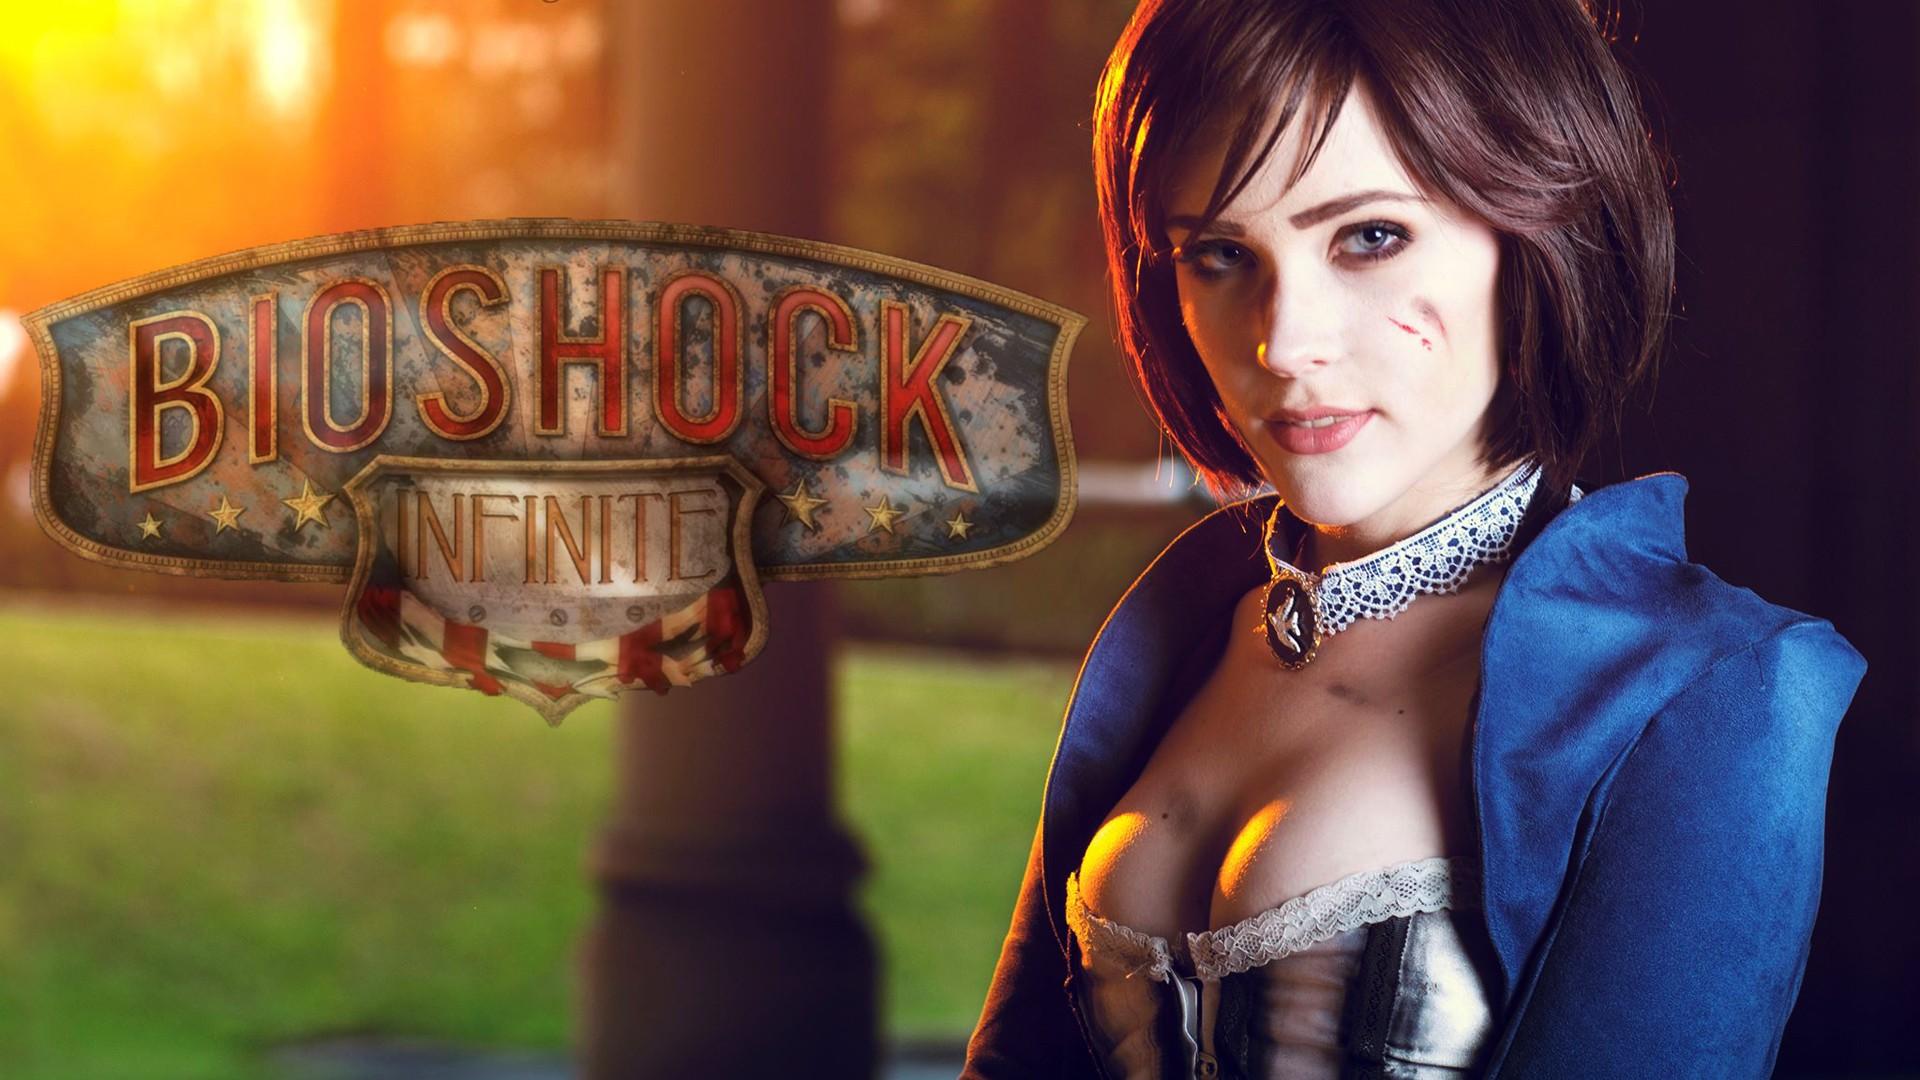 People 1920x1080 Elizabeth (BioShock) video games women boobs necklace makeup video game girls brunette model looking at viewer